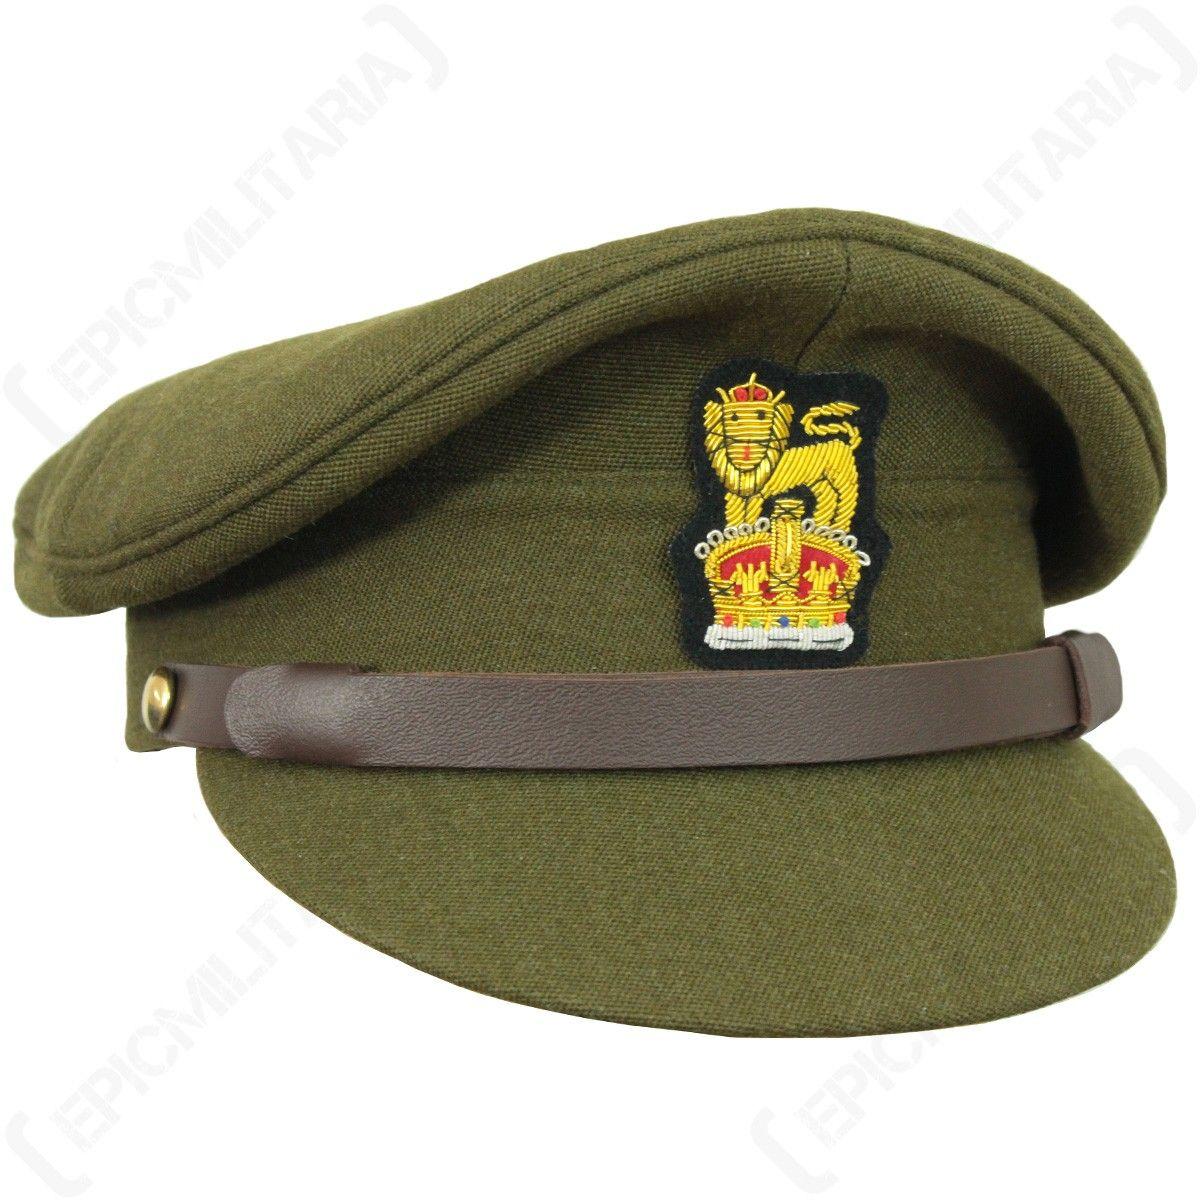 New Soviet Union Russian Army RKKA PILOT Air Force Hat Cap WW2 High quality